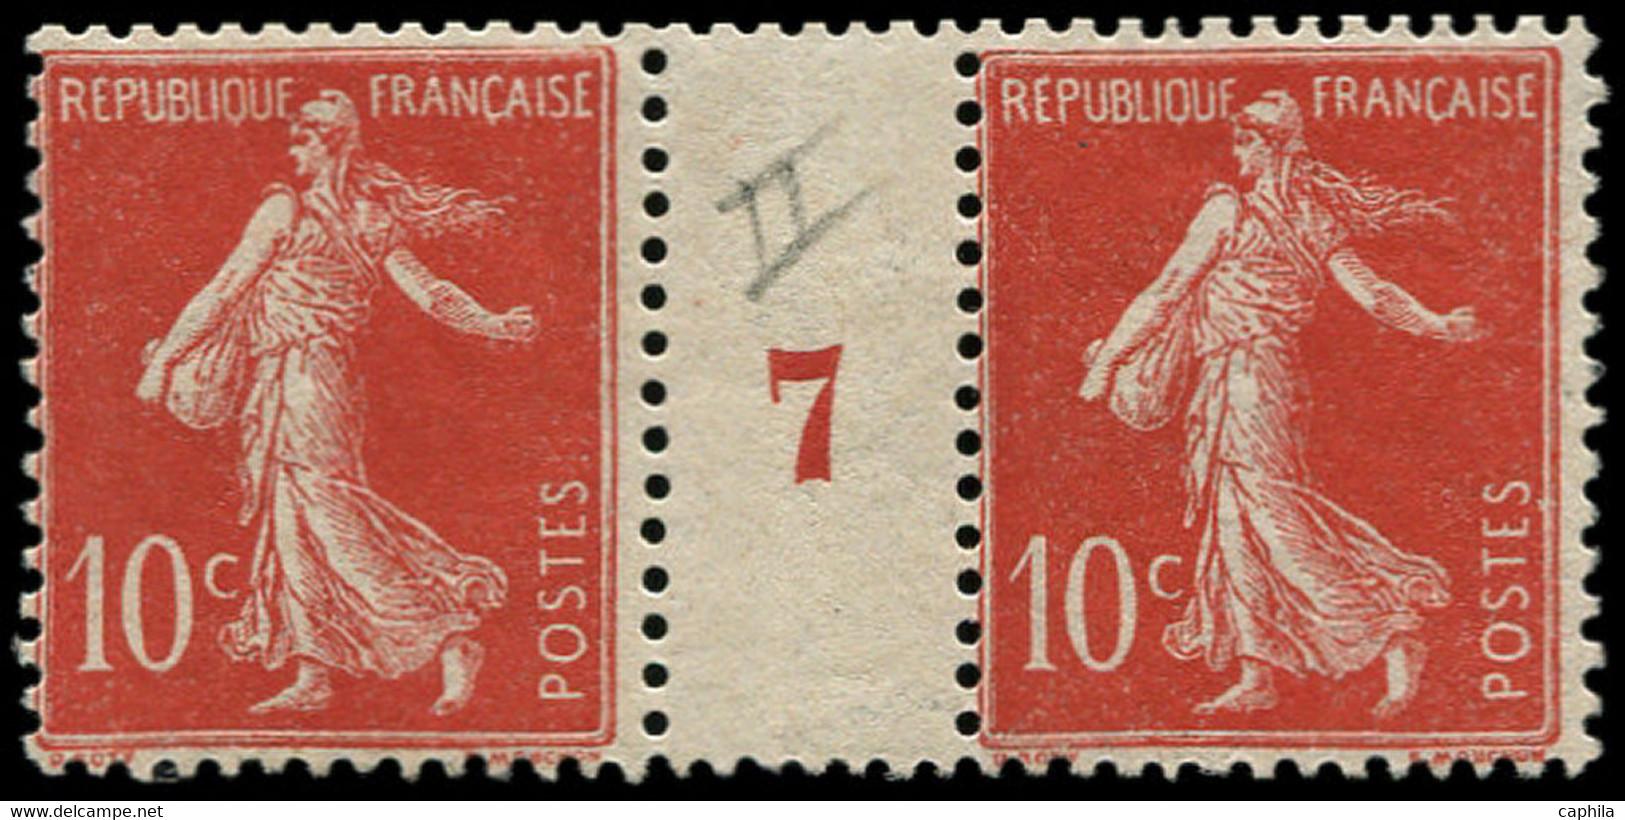 "** FRANCE - Poste - 135, Type IIa, Paire Millésime ""7"", Pli Sur Millésime: 10c. Semeuse Rouge - Unused Stamps"